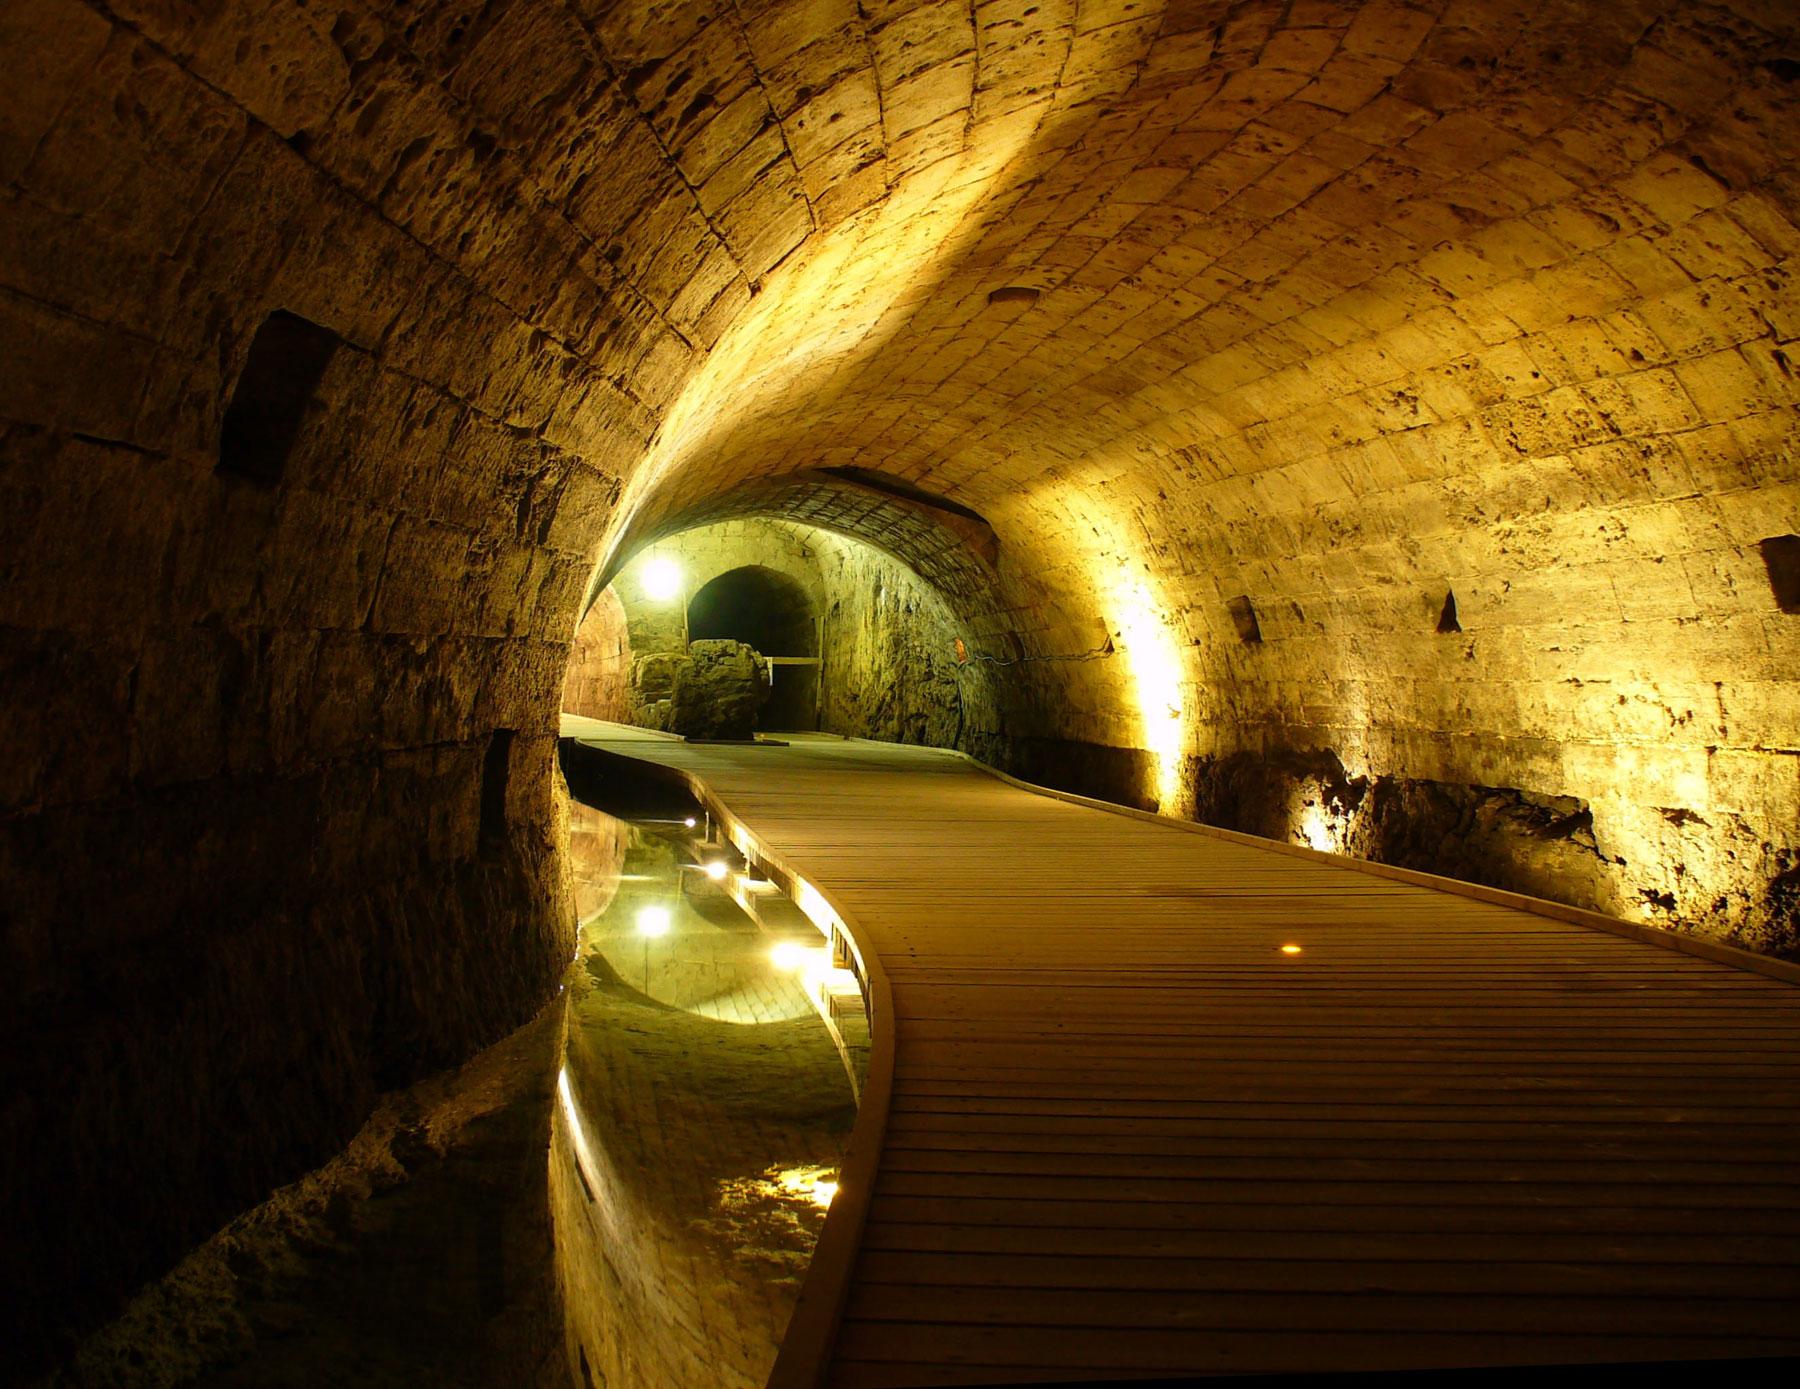 Akko's Crusader tunnel